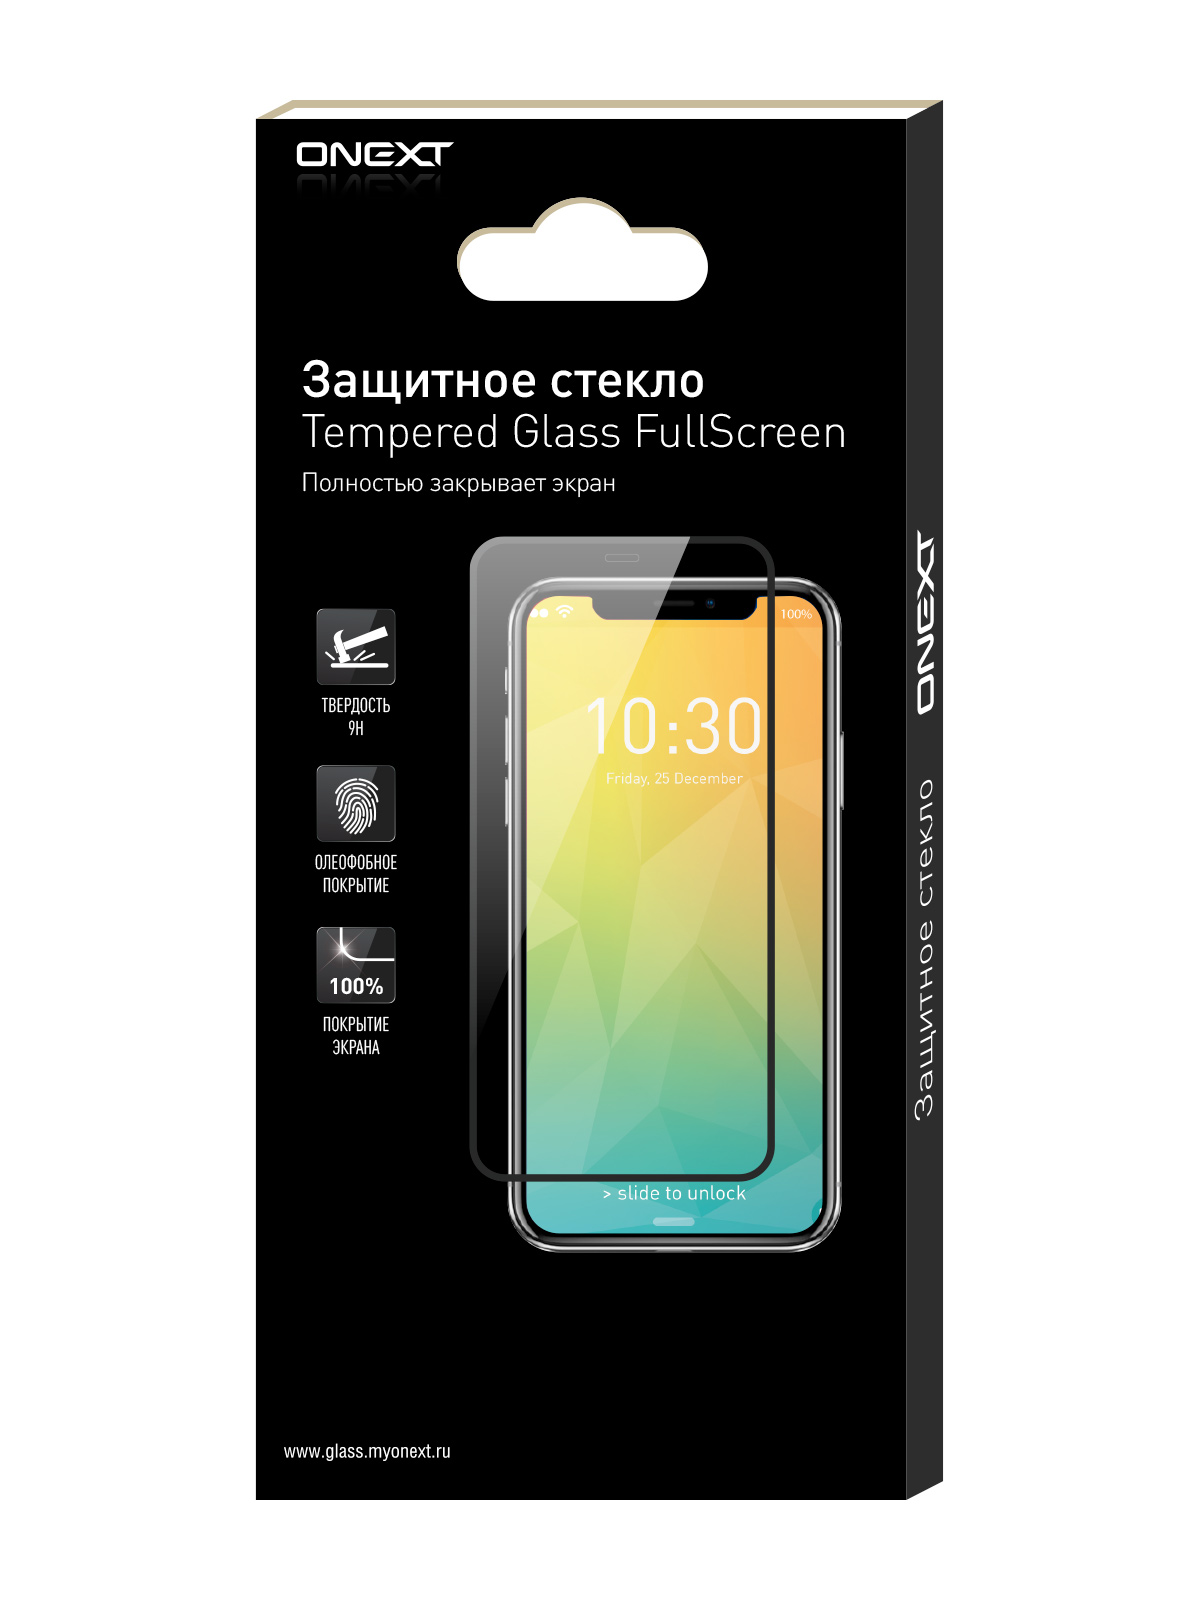 Защитное стекло ONEXT для Asus ZenFone Max M1 (2018) Black